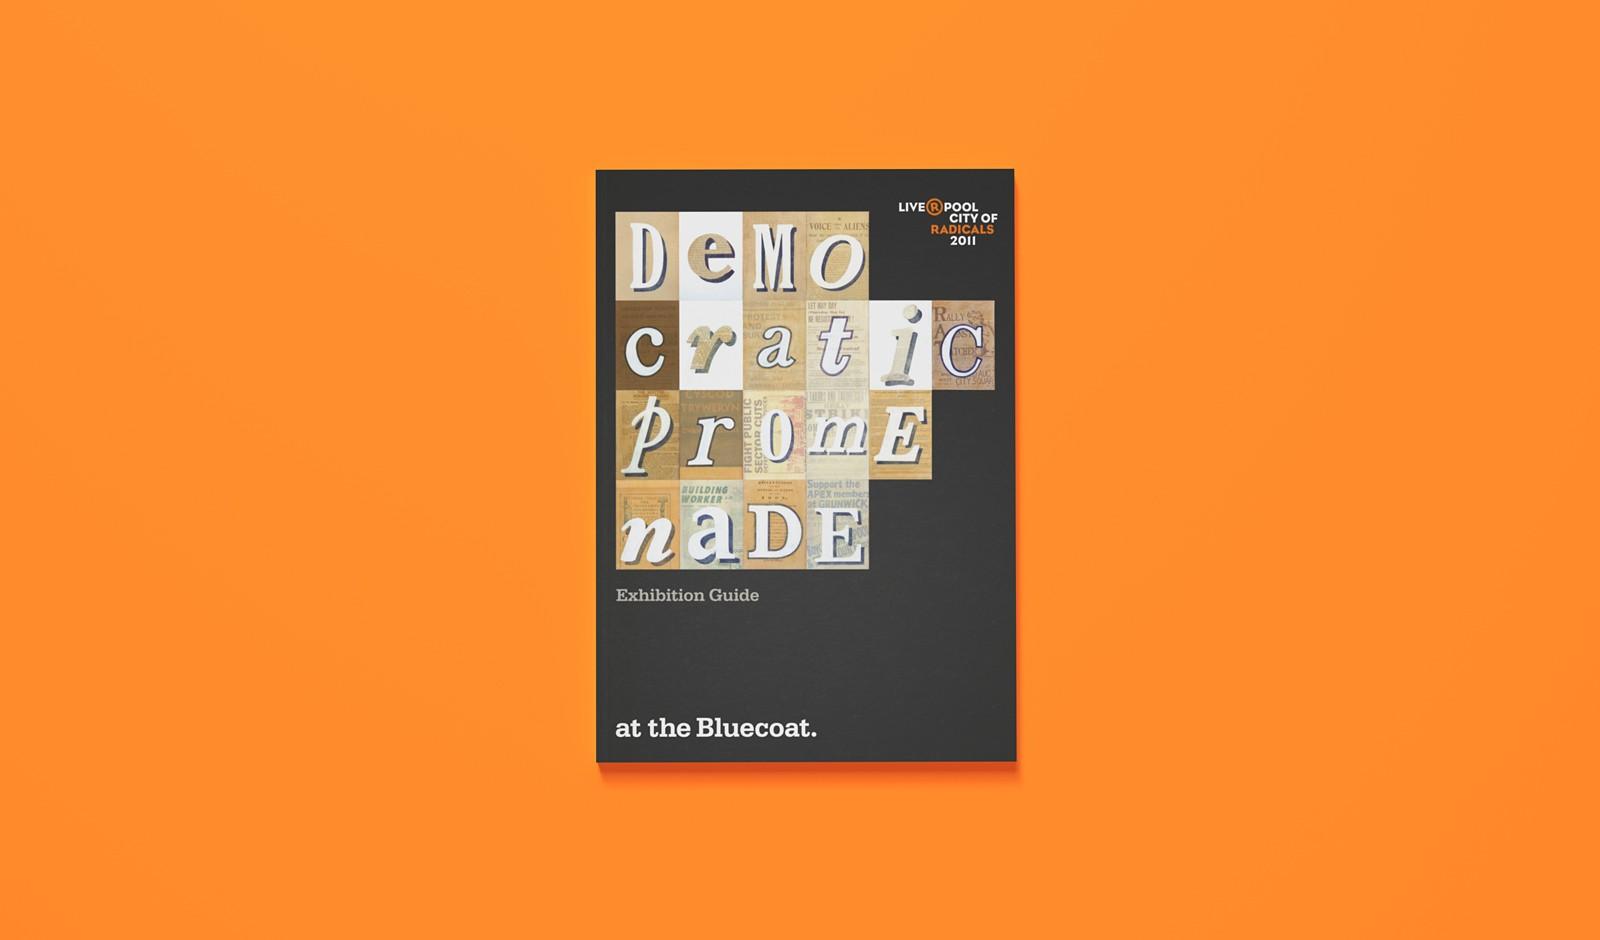 Exhibition guide: Democratic Promenade